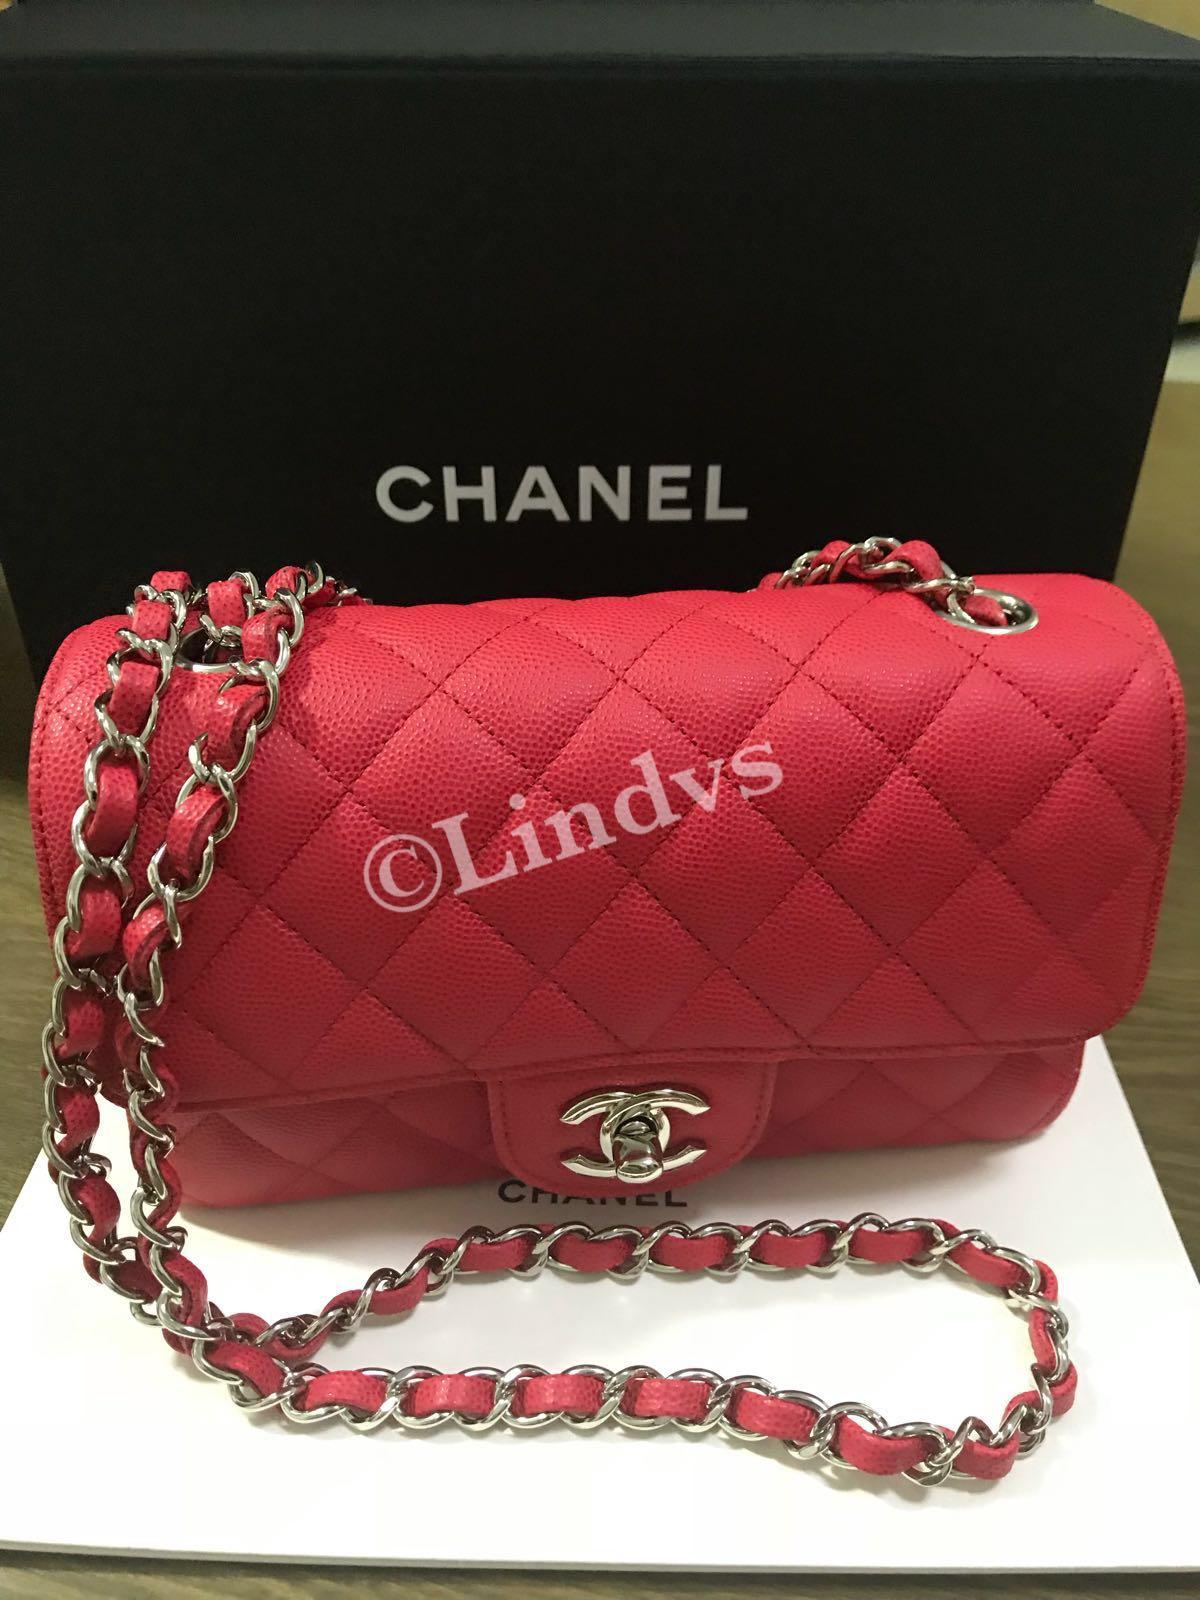 0f43a6456f3f Chanel mini rectangular 18C (Authentic), Barangan Mewah, Beg dan Dompet di  Carousell